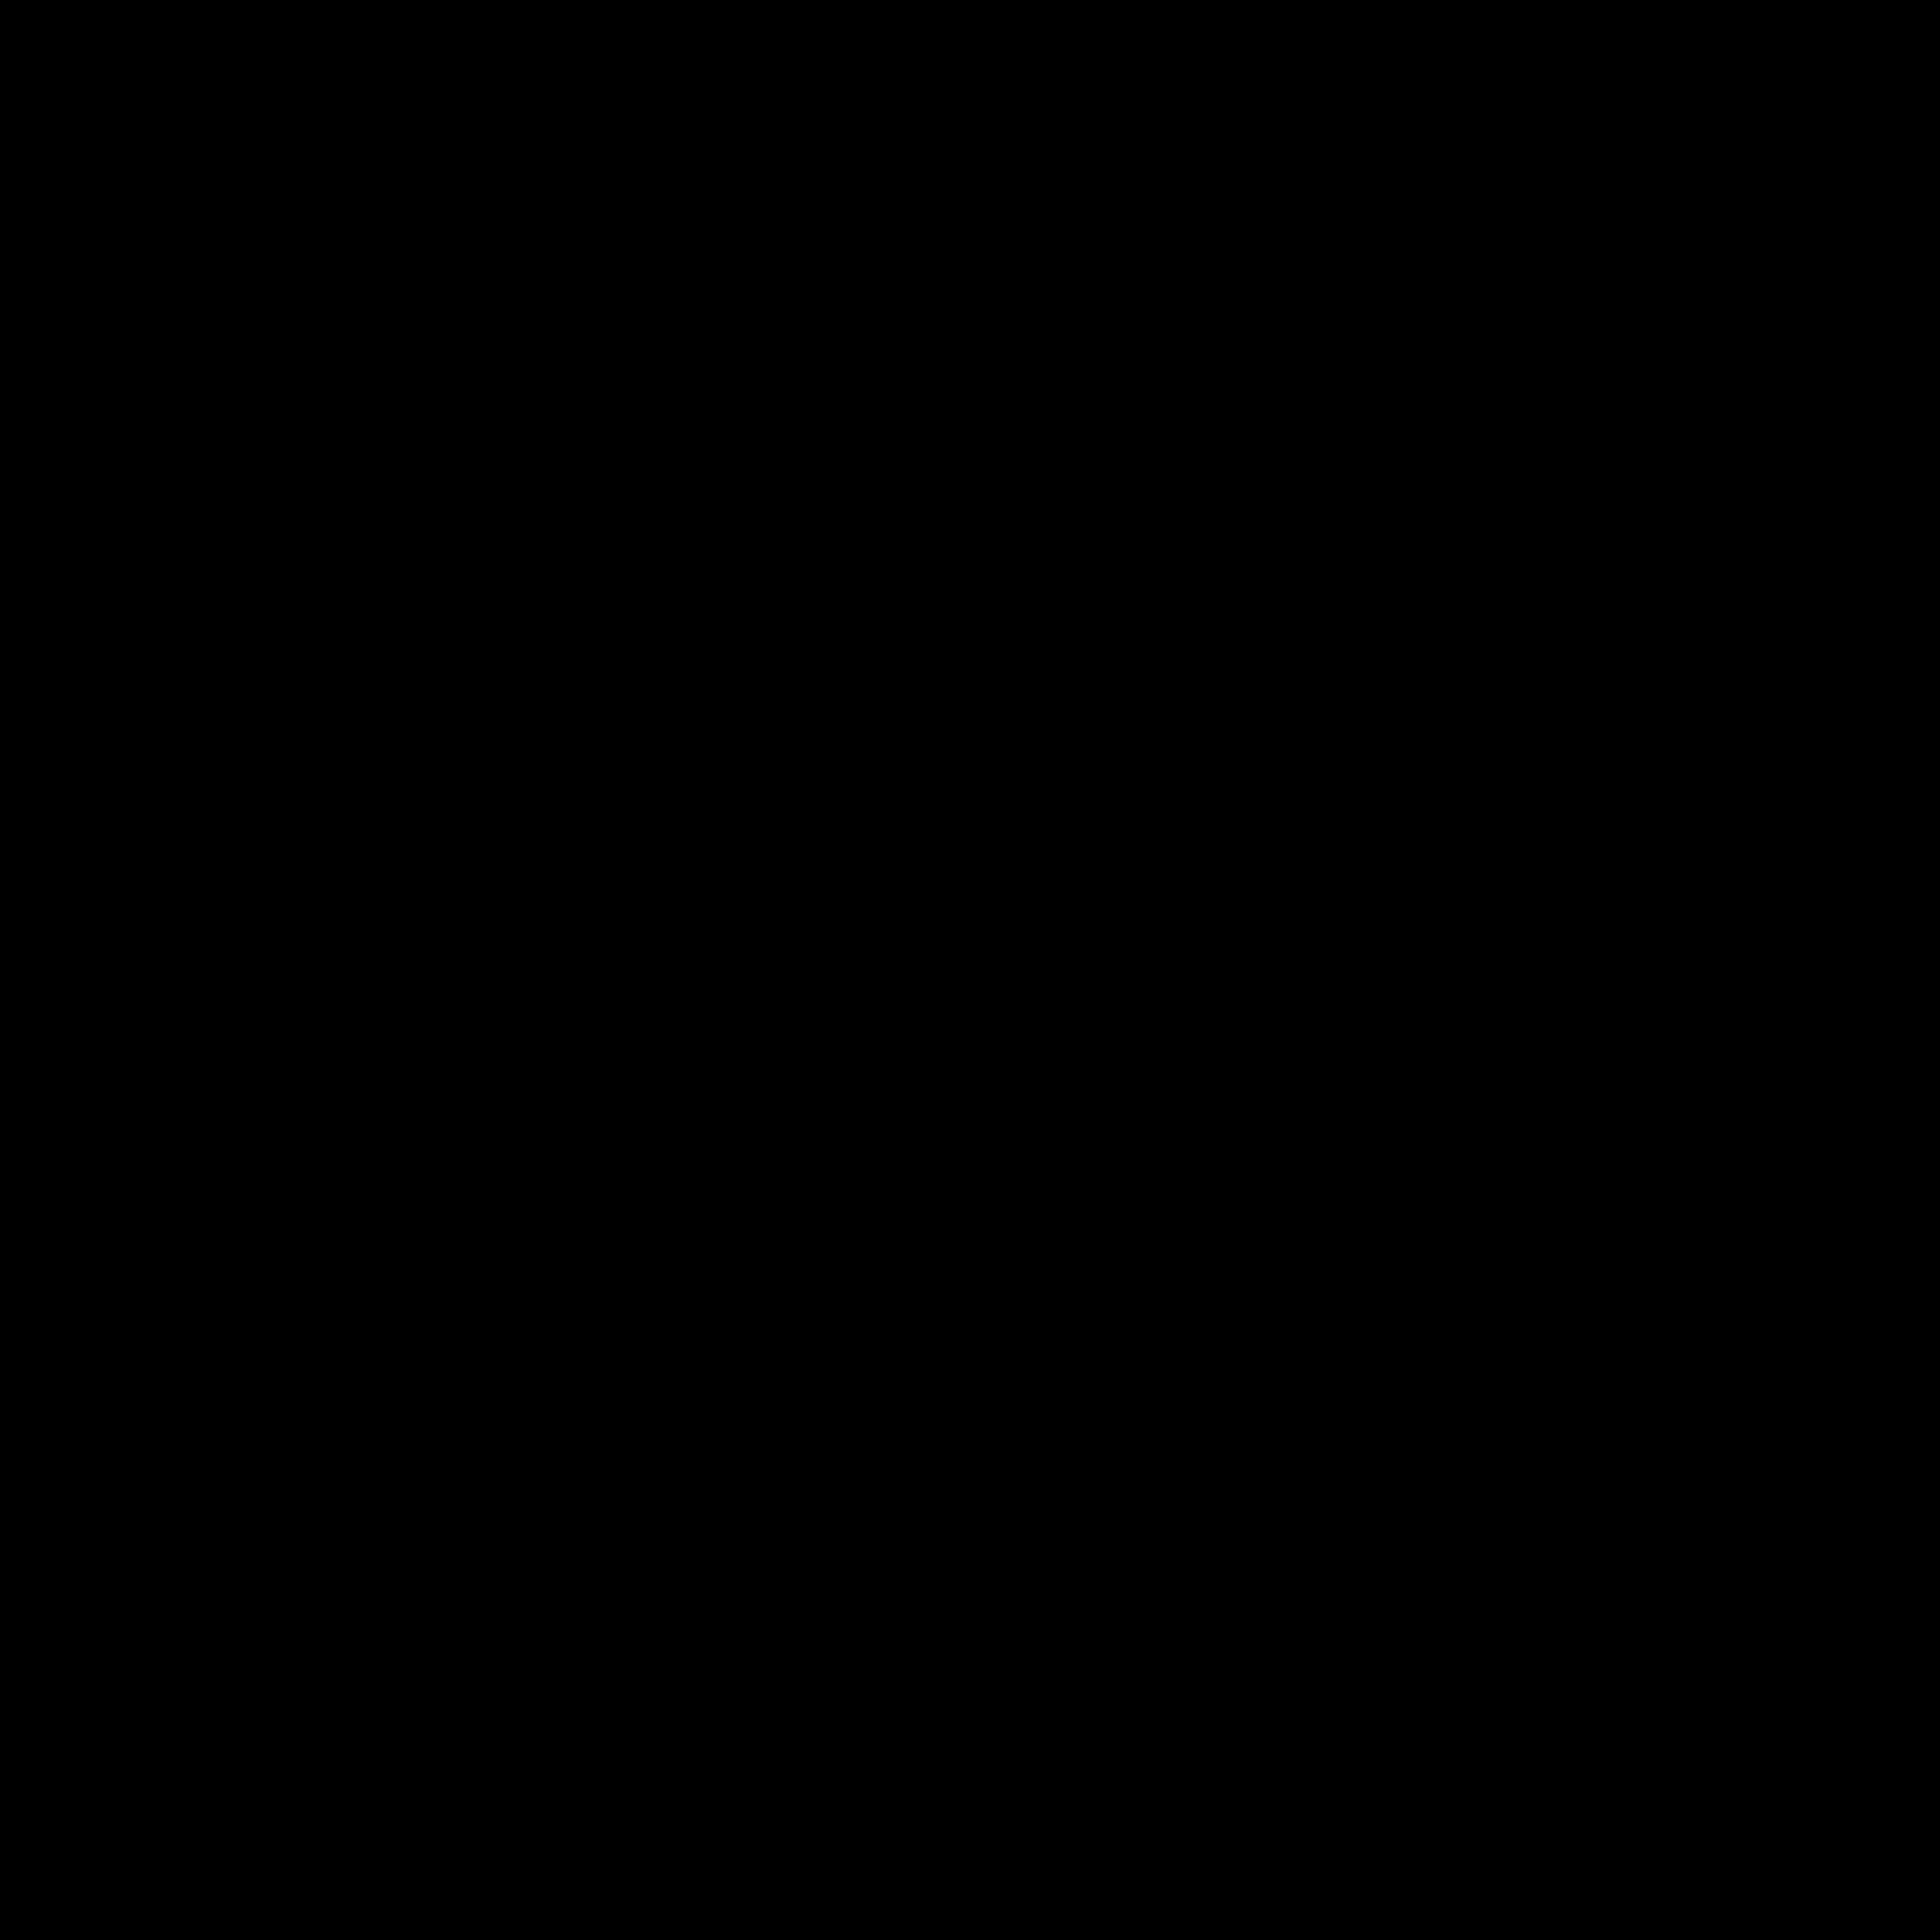 Clipart png circle. Futurist big image